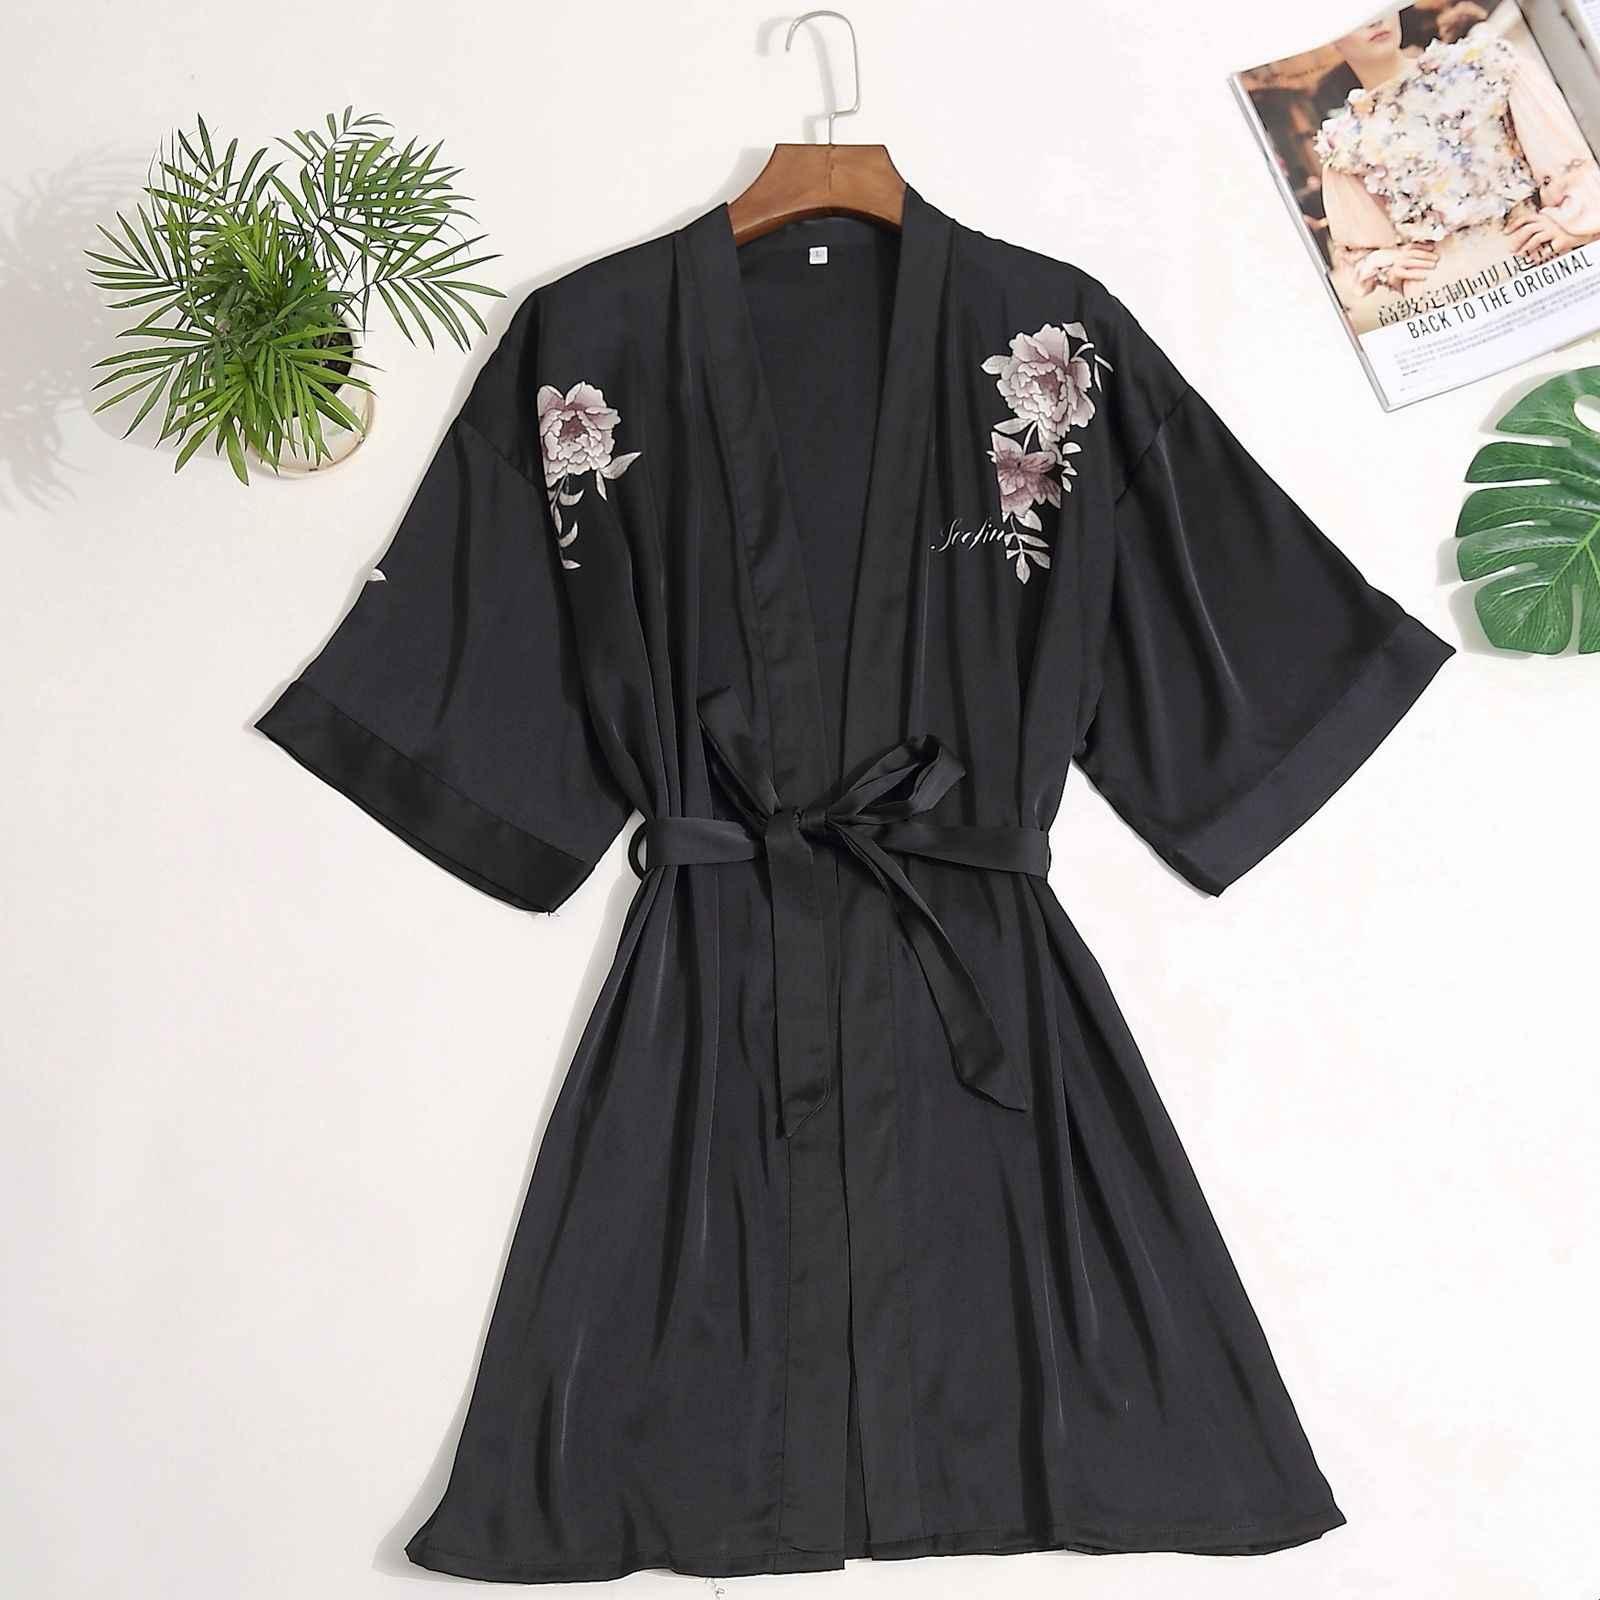 ... Brand New Floral Robe Kimono Women Dressing Gown Half Sleeve Loose  Ladies Sleepwear Robes ... 556ff31ce